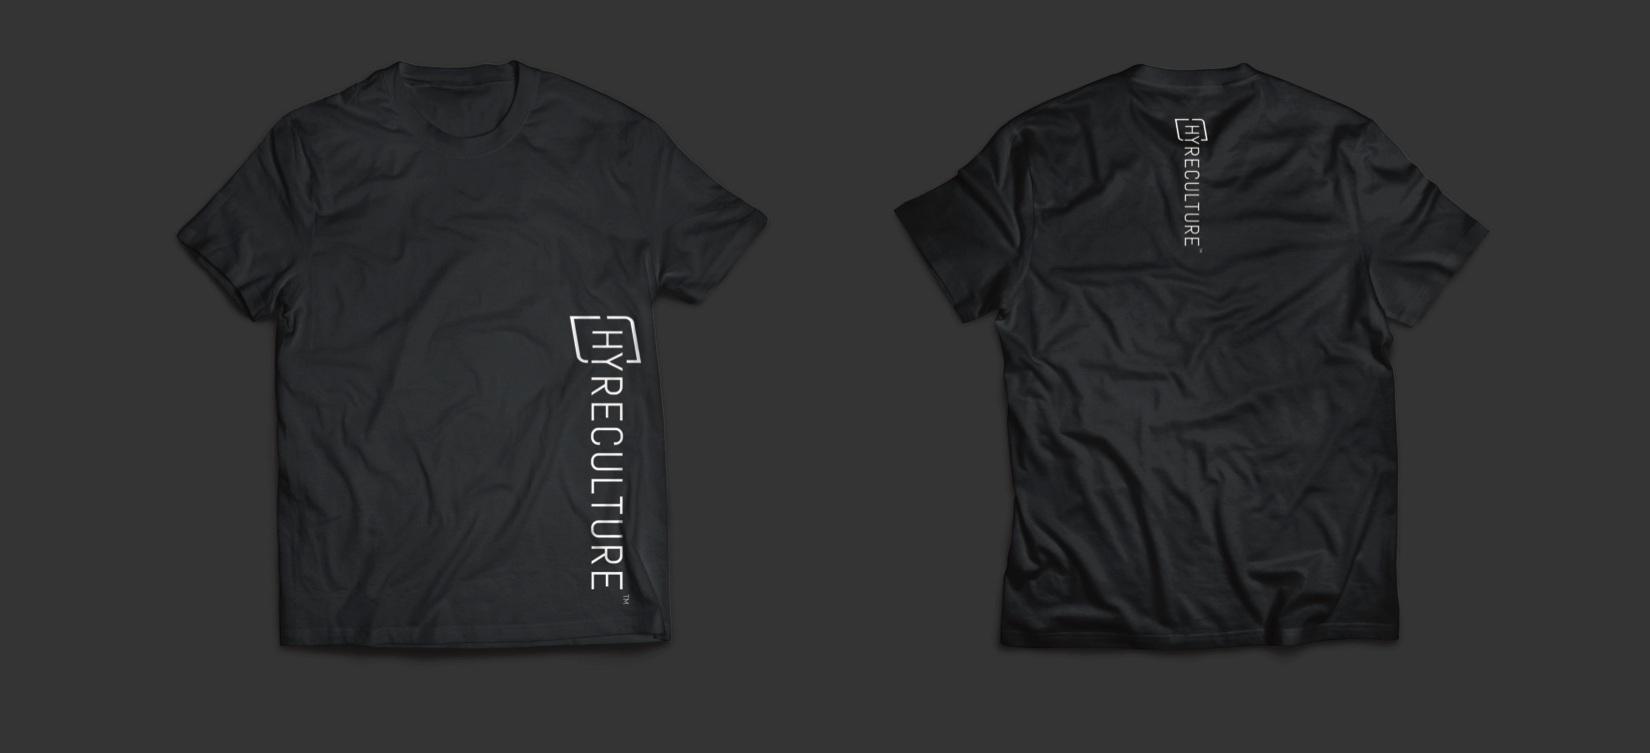 17-HyreCulture-BrandDeck-Tshirt.jpg